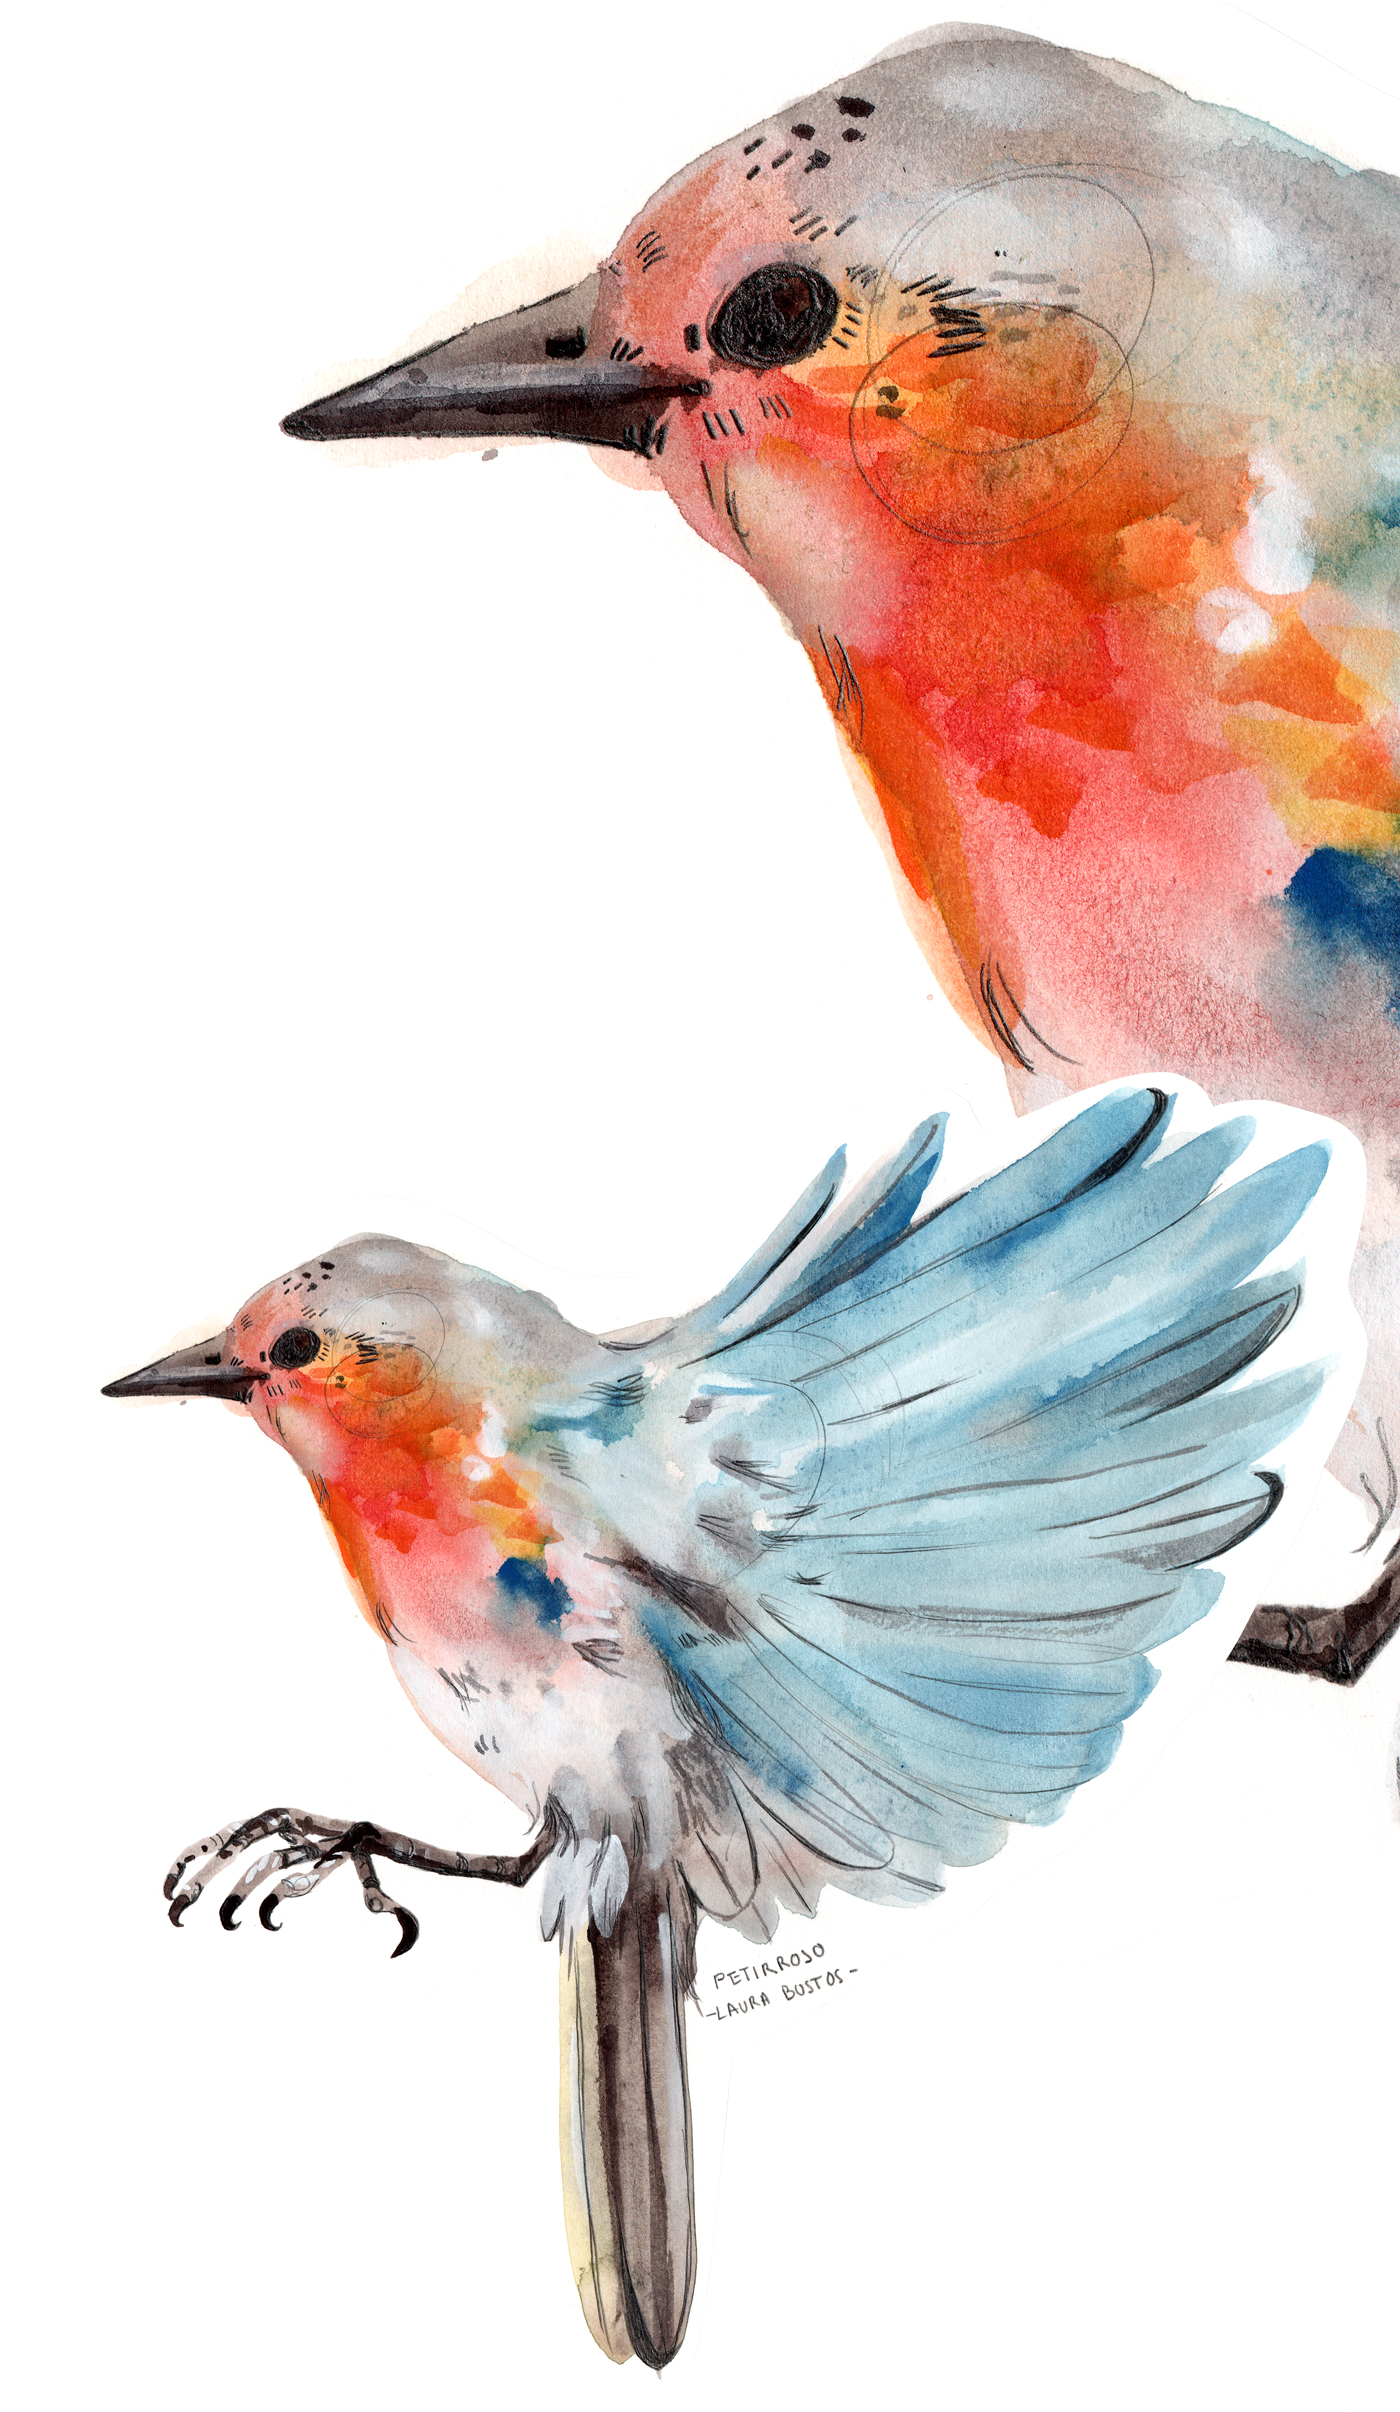 Proyecto personal pájaro Petirrojo, robin realizado en grafito acuarelable